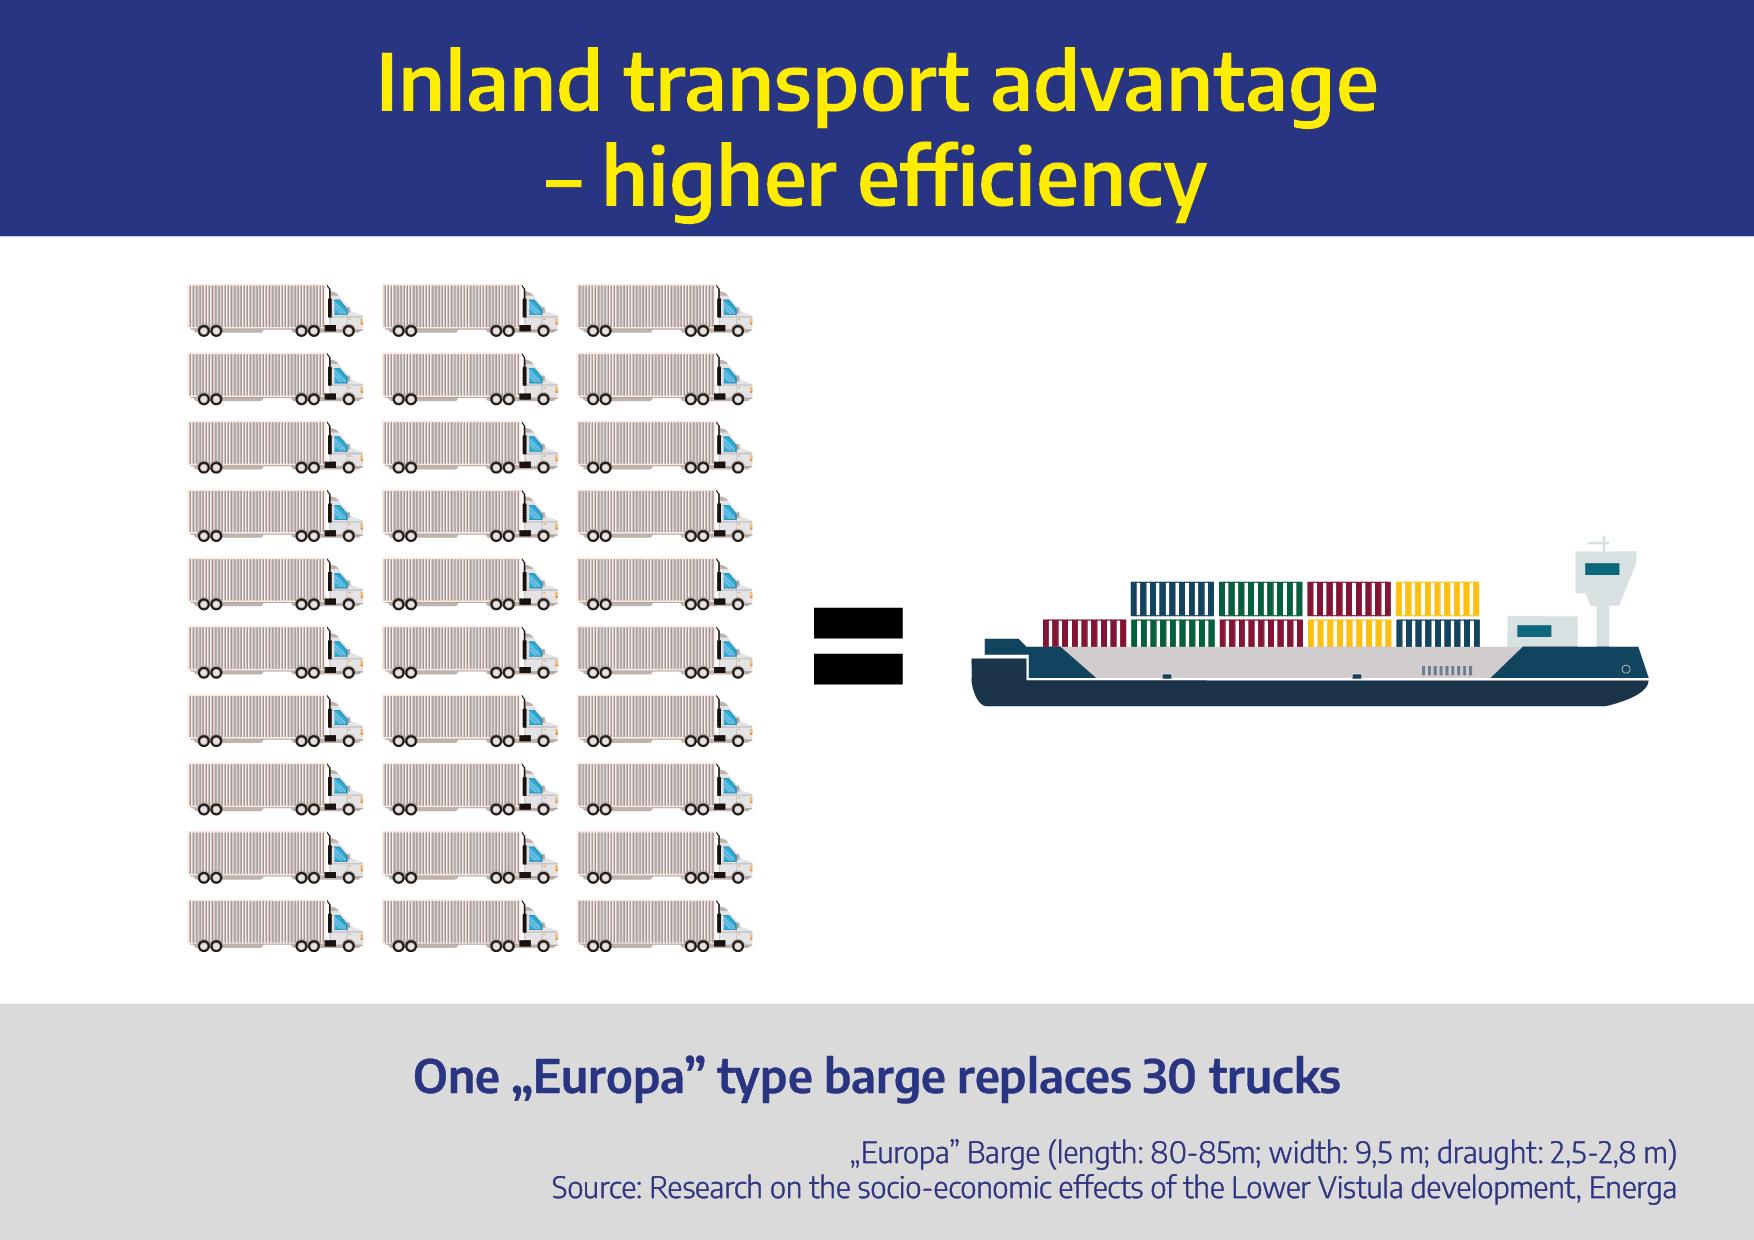 BENEFITS OF INLAND TRANSPORT